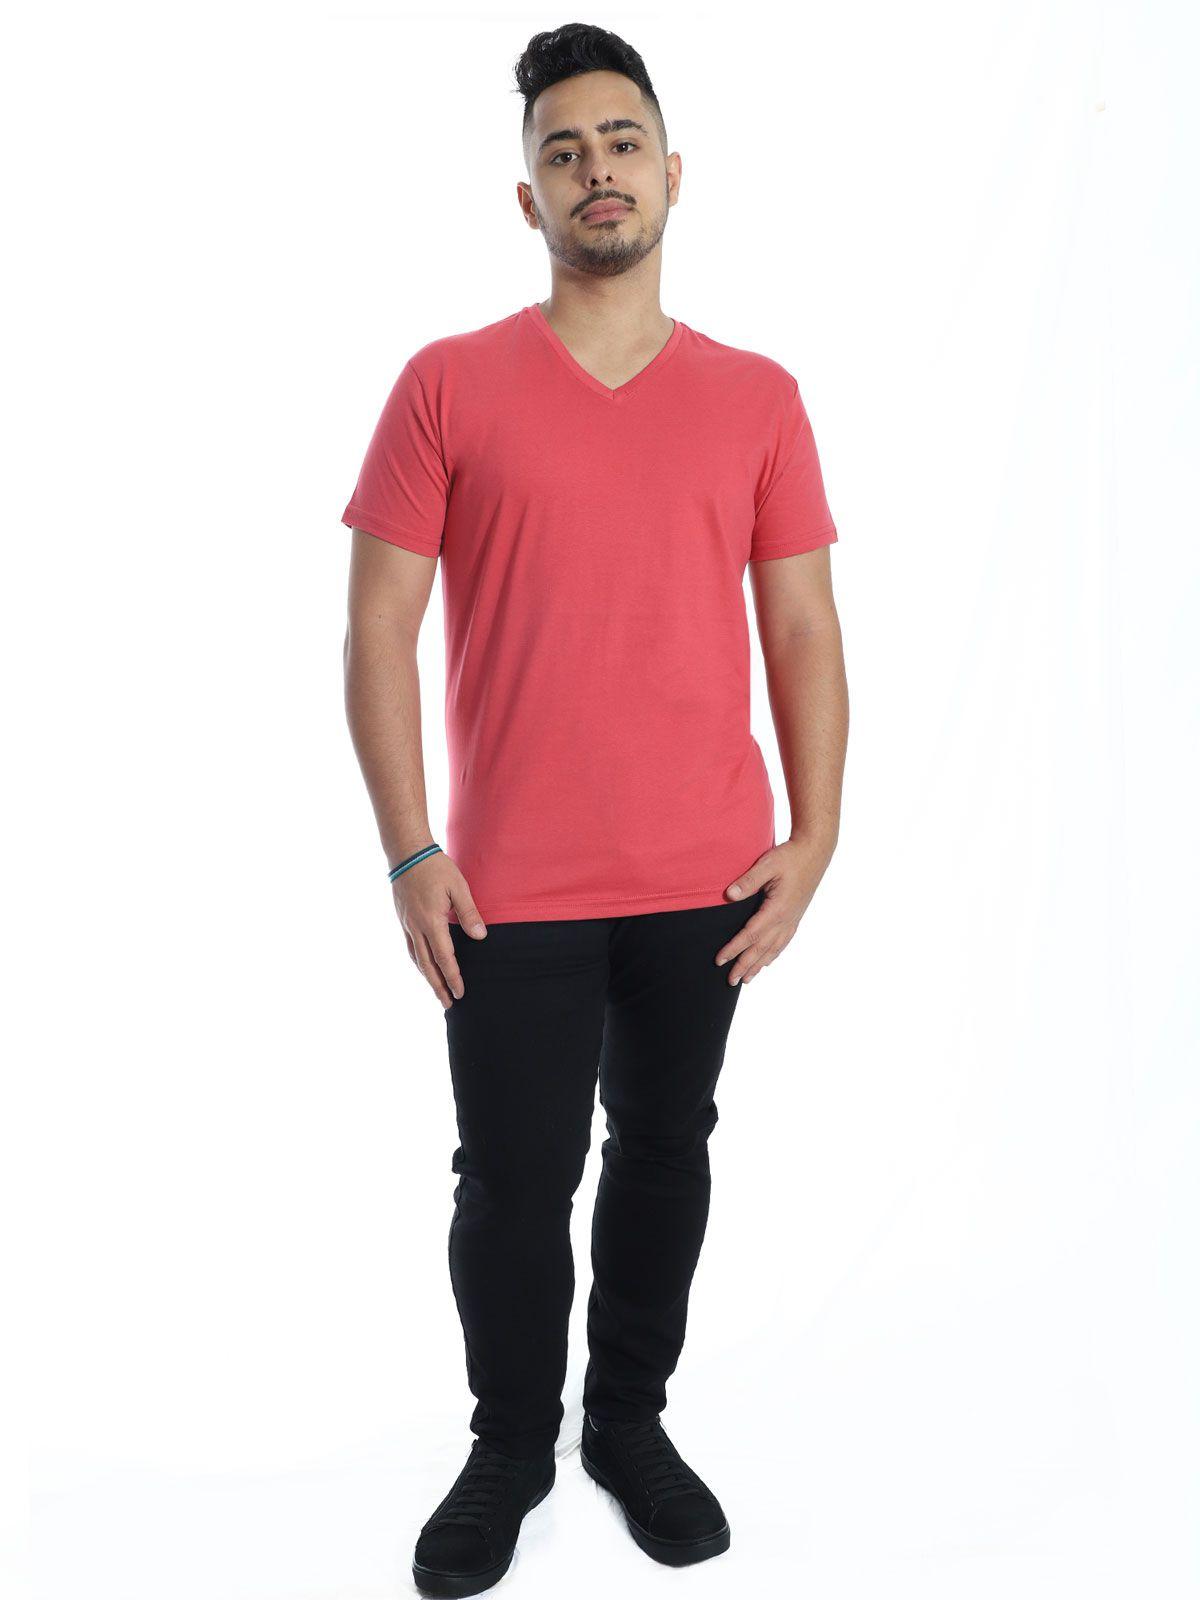 Camiseta Anistia Slim Fit Decote V. Lisa Vermelho